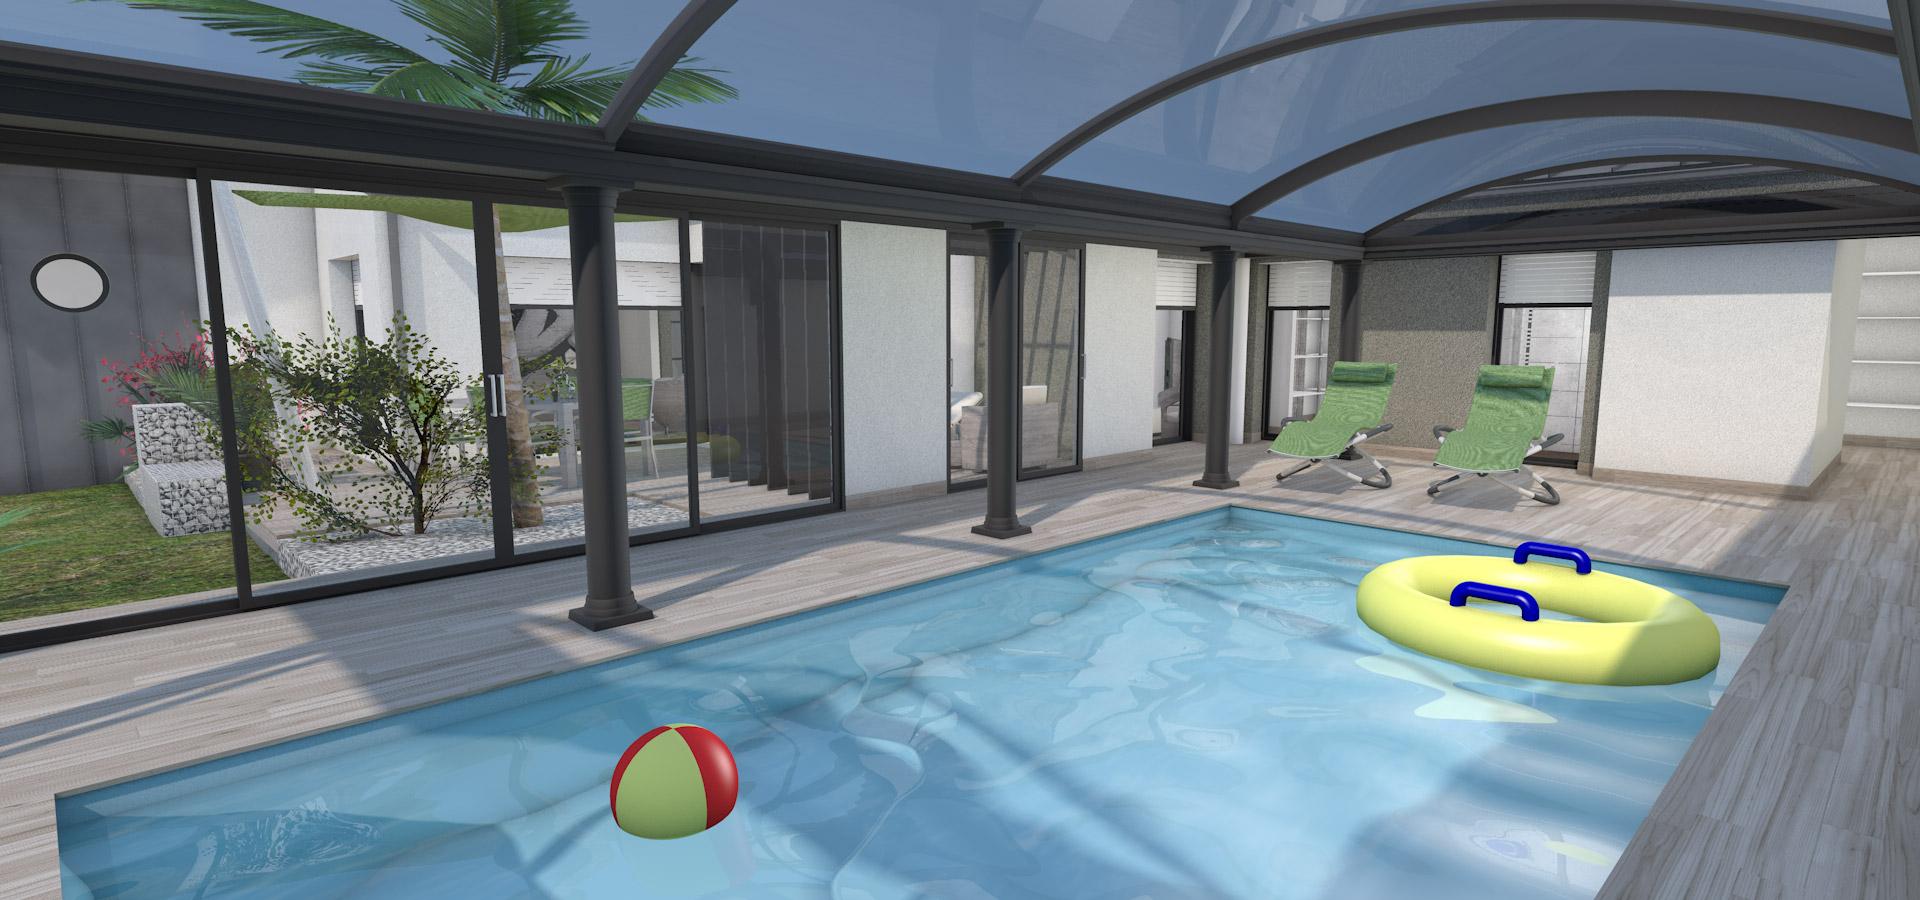 Nos r alisations serge ratouit habitat vend e for Abri piscine pool up